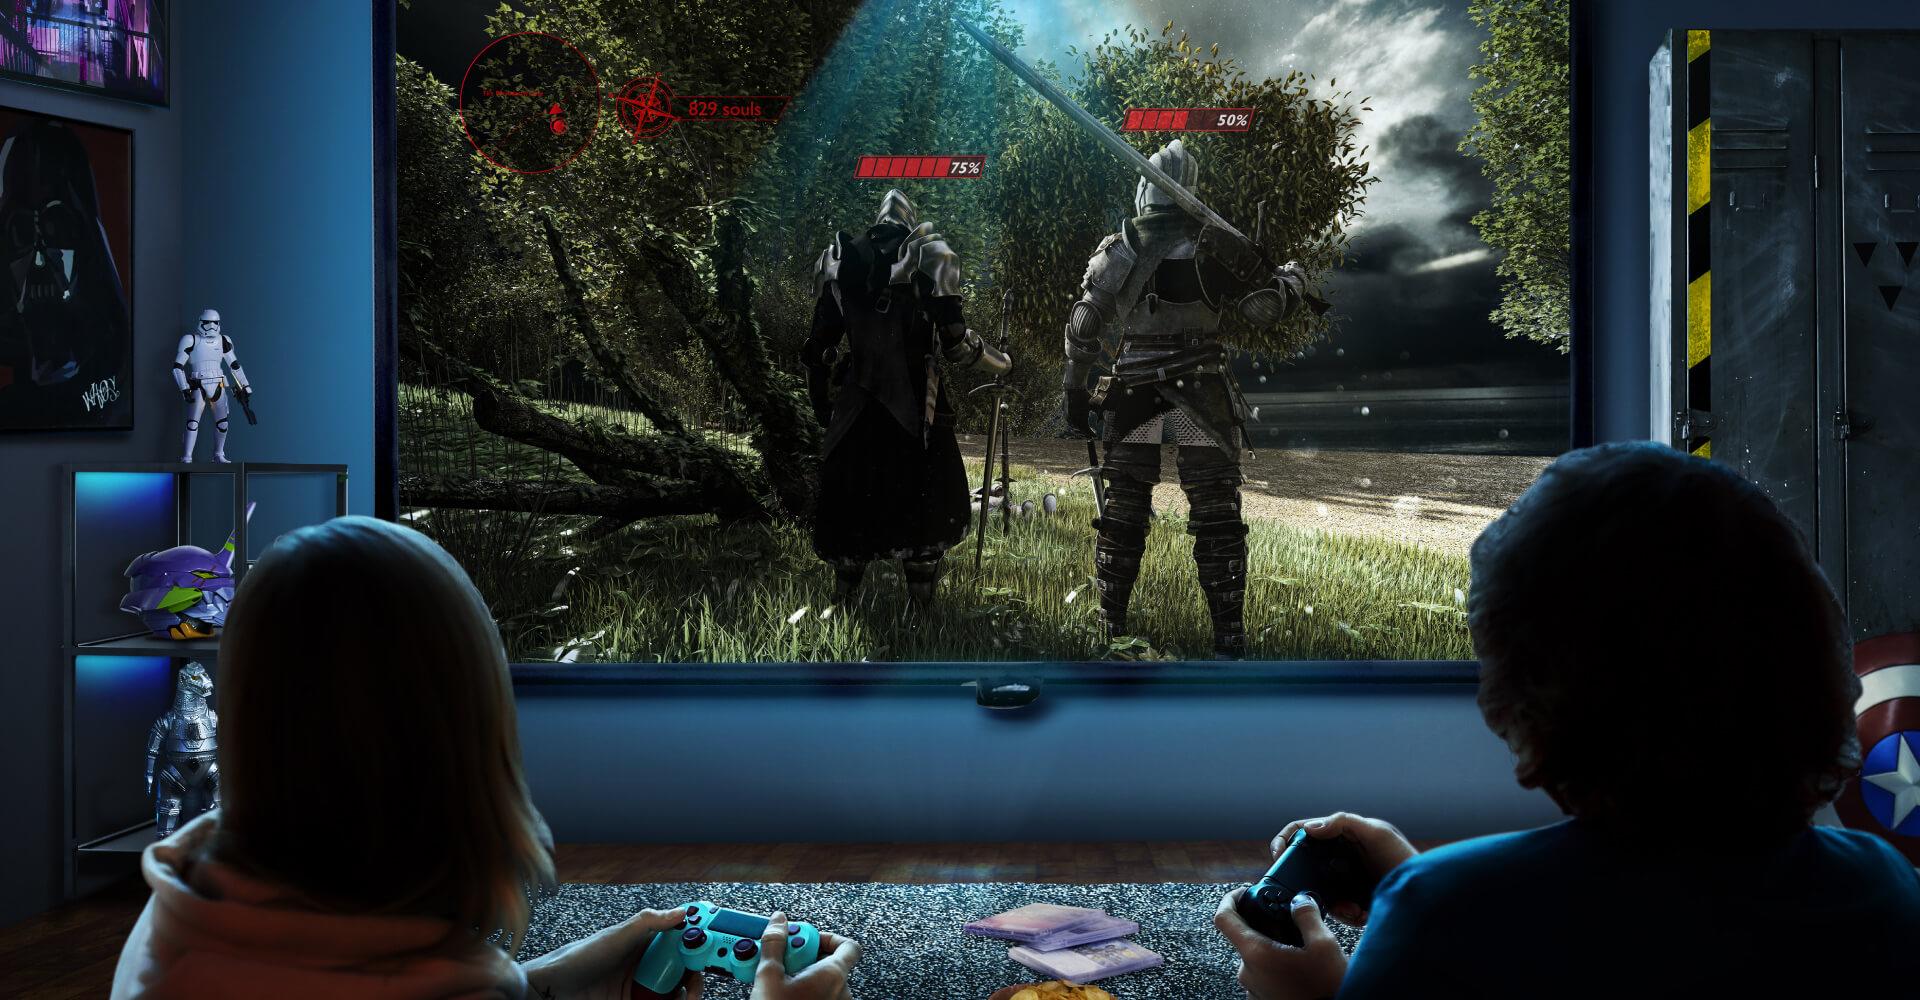 https://www.benq.com/content/dam/b2c/en/projectors/gaming-projector/tk700sti/feature/gaming-tk700sti-unrestrained-wonders.jpg